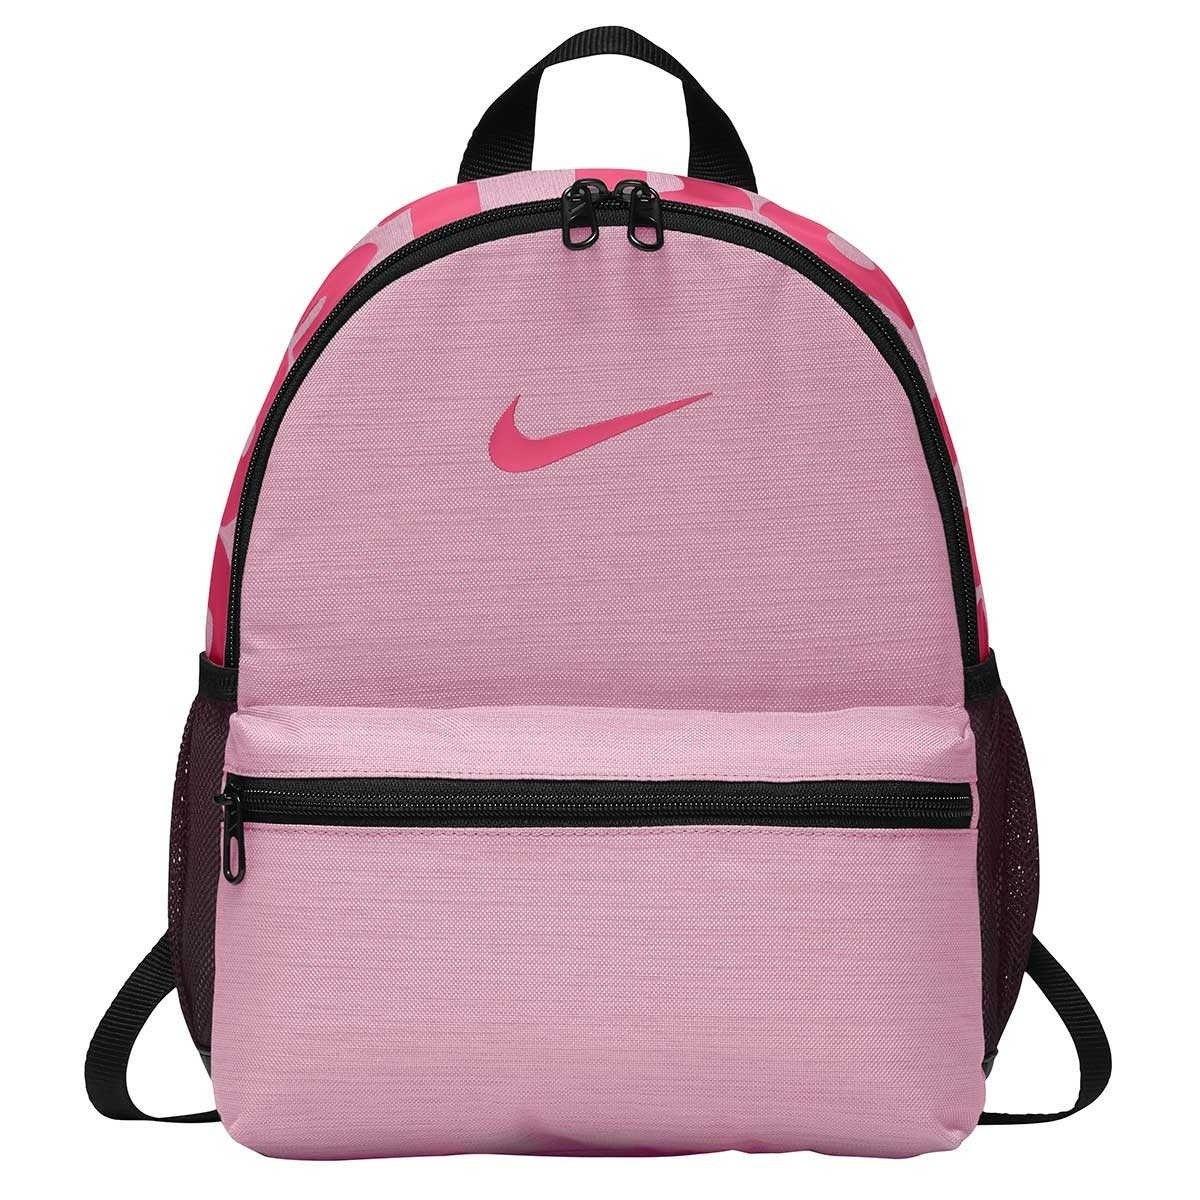 e2918b1ce Mochila Nike Brasilia Just Do It Rosa Mujer Niña Original - $ 1.148 ...